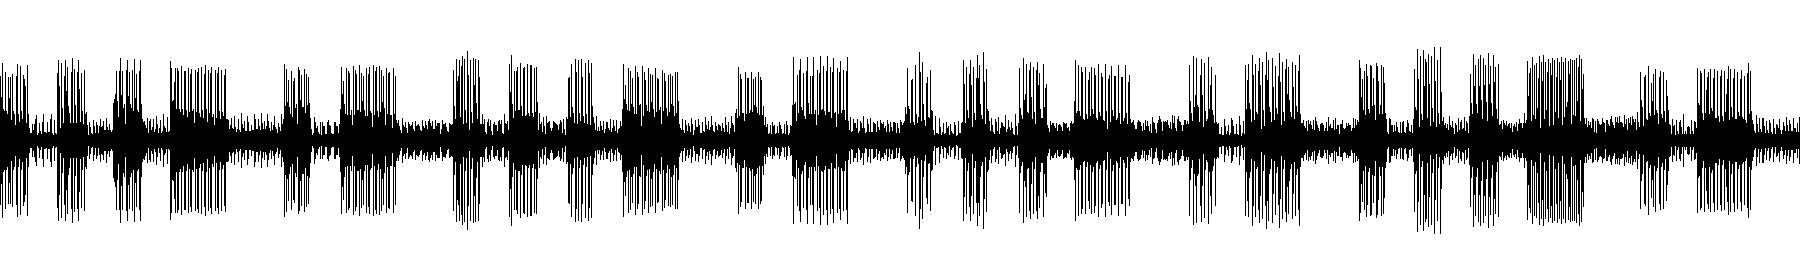 159547 130 bass loop c2 wav